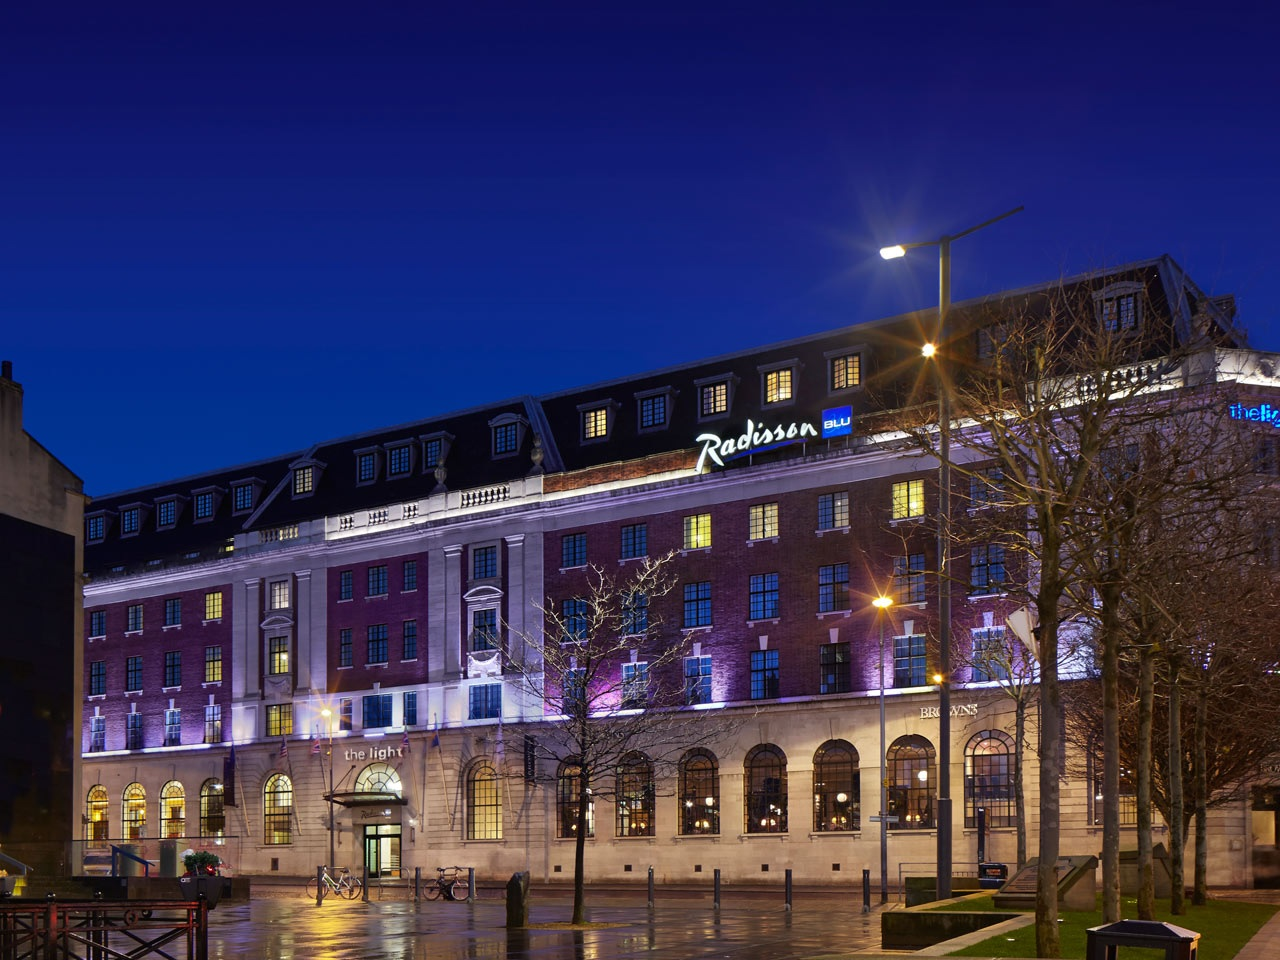 Radisson blu leeds review hotel designs for Hotel design 2016